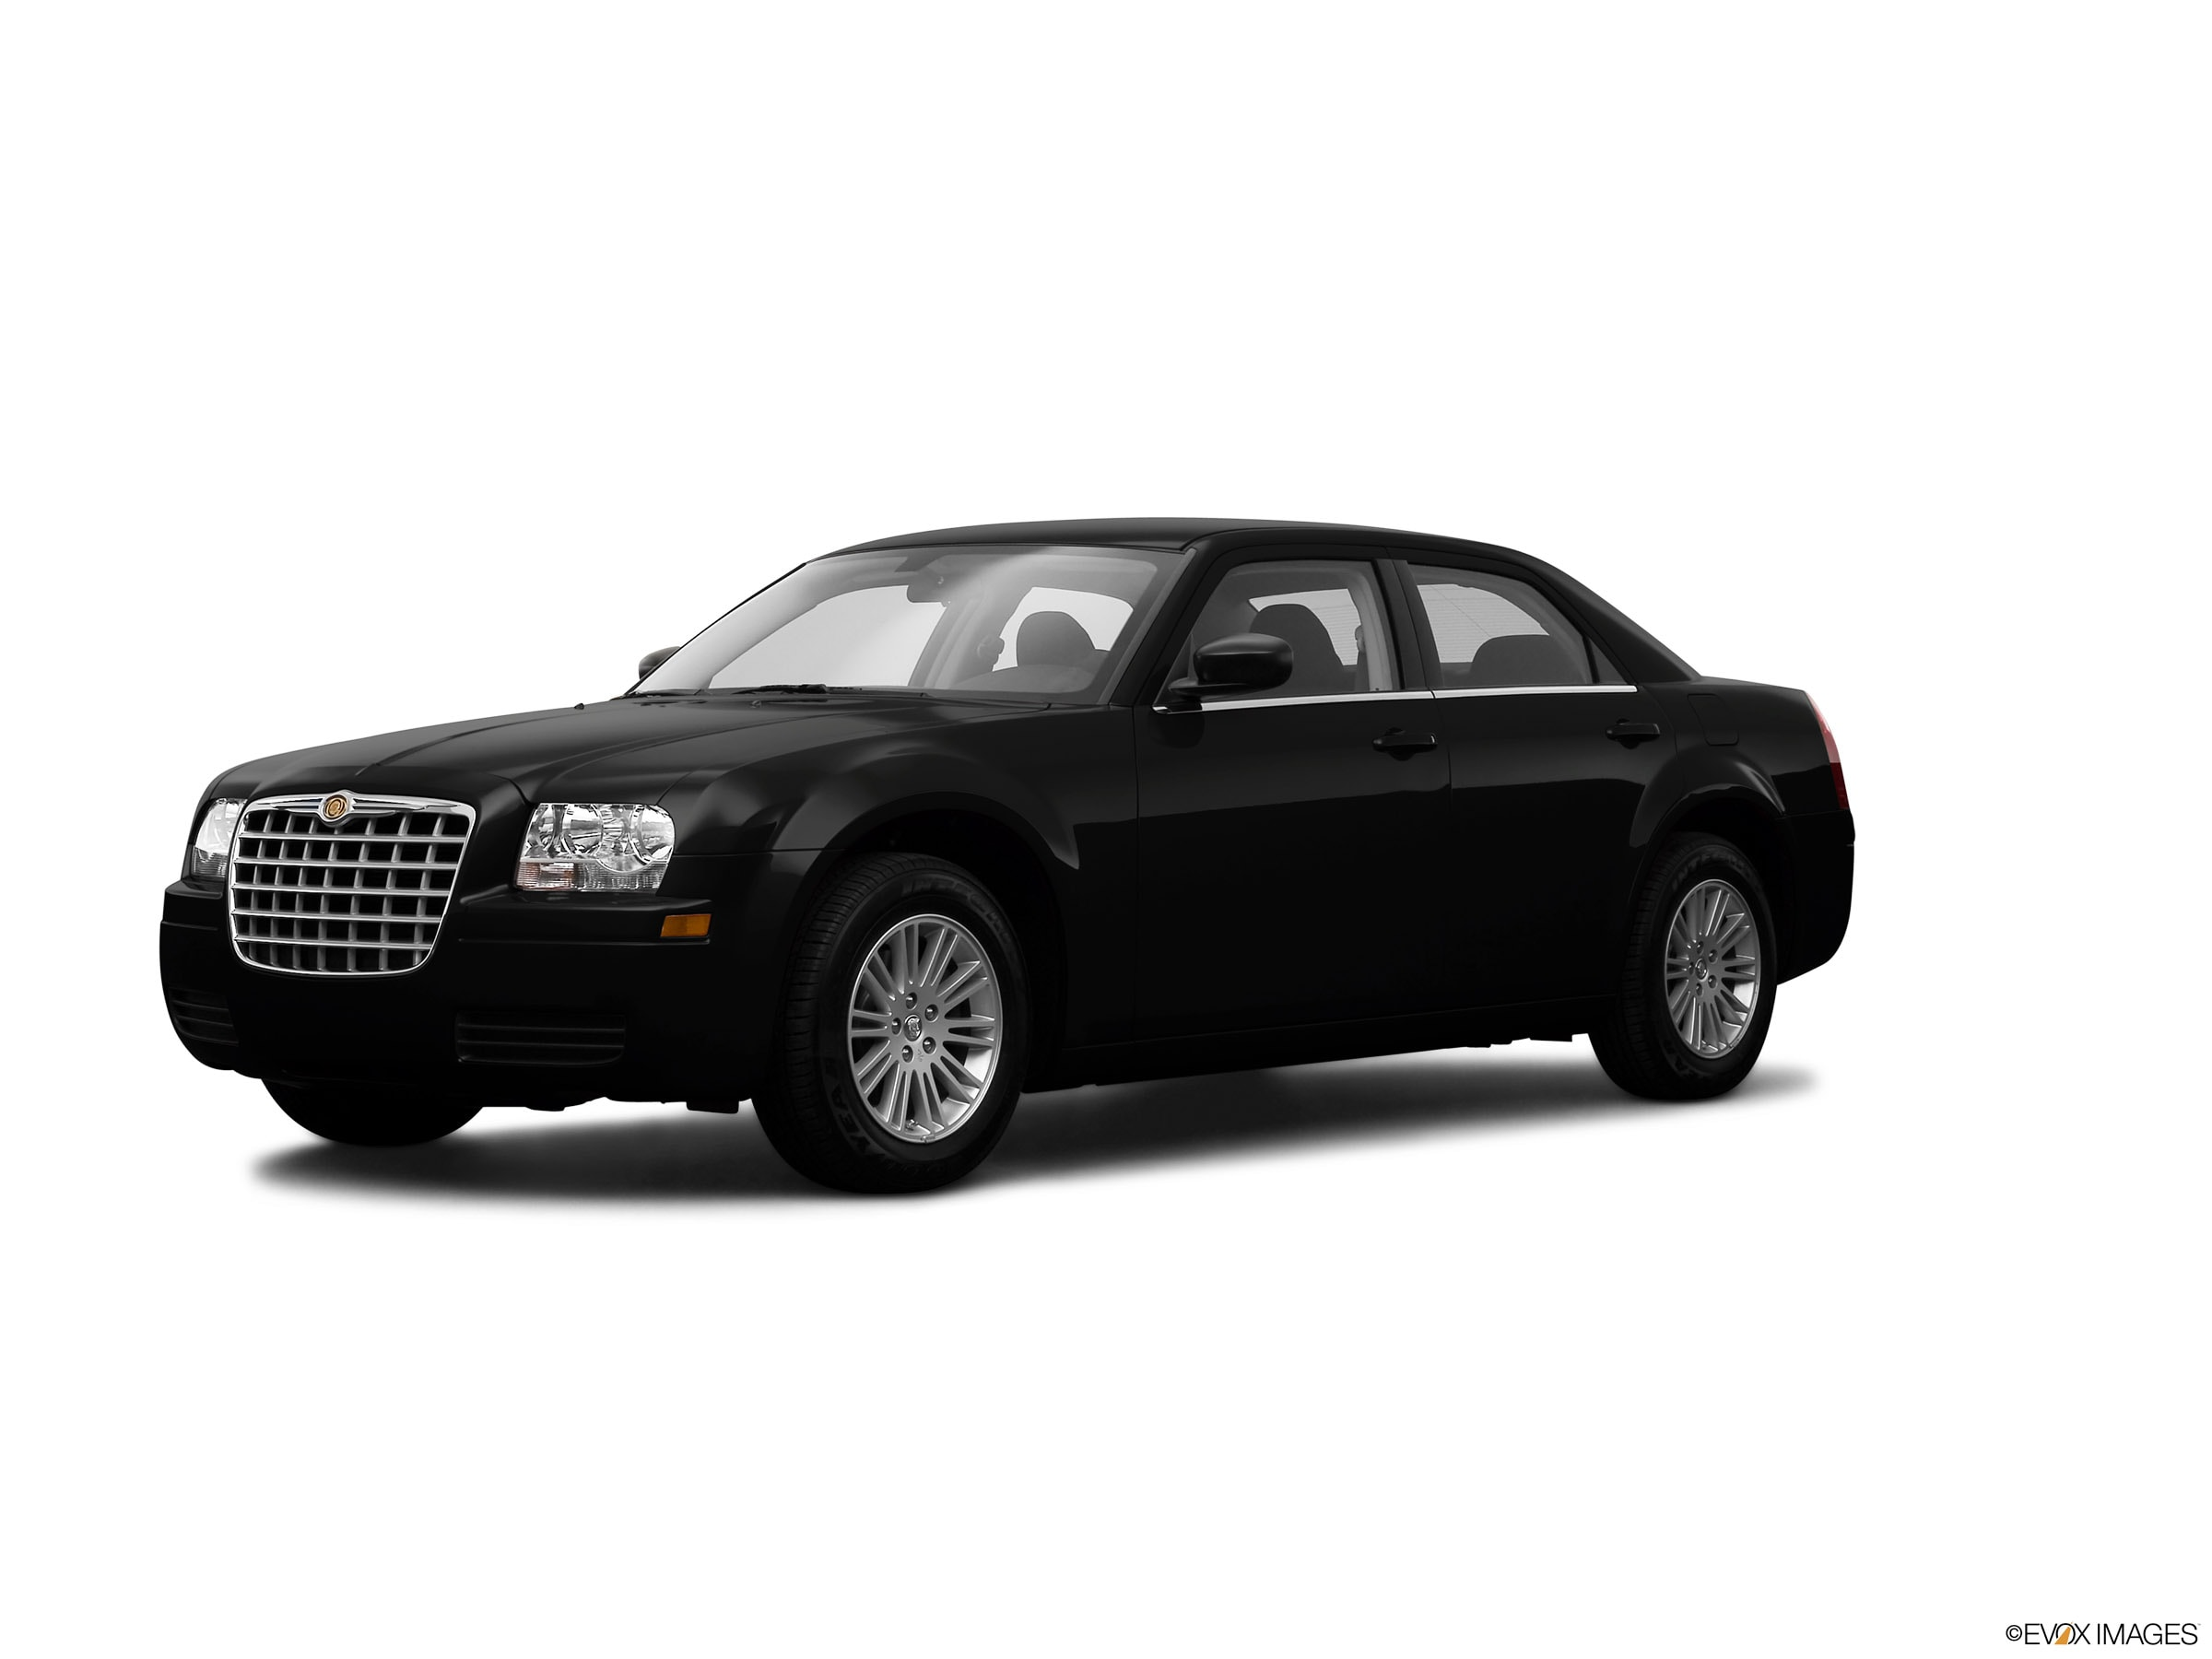 2009 Chrysler 300 Sedan